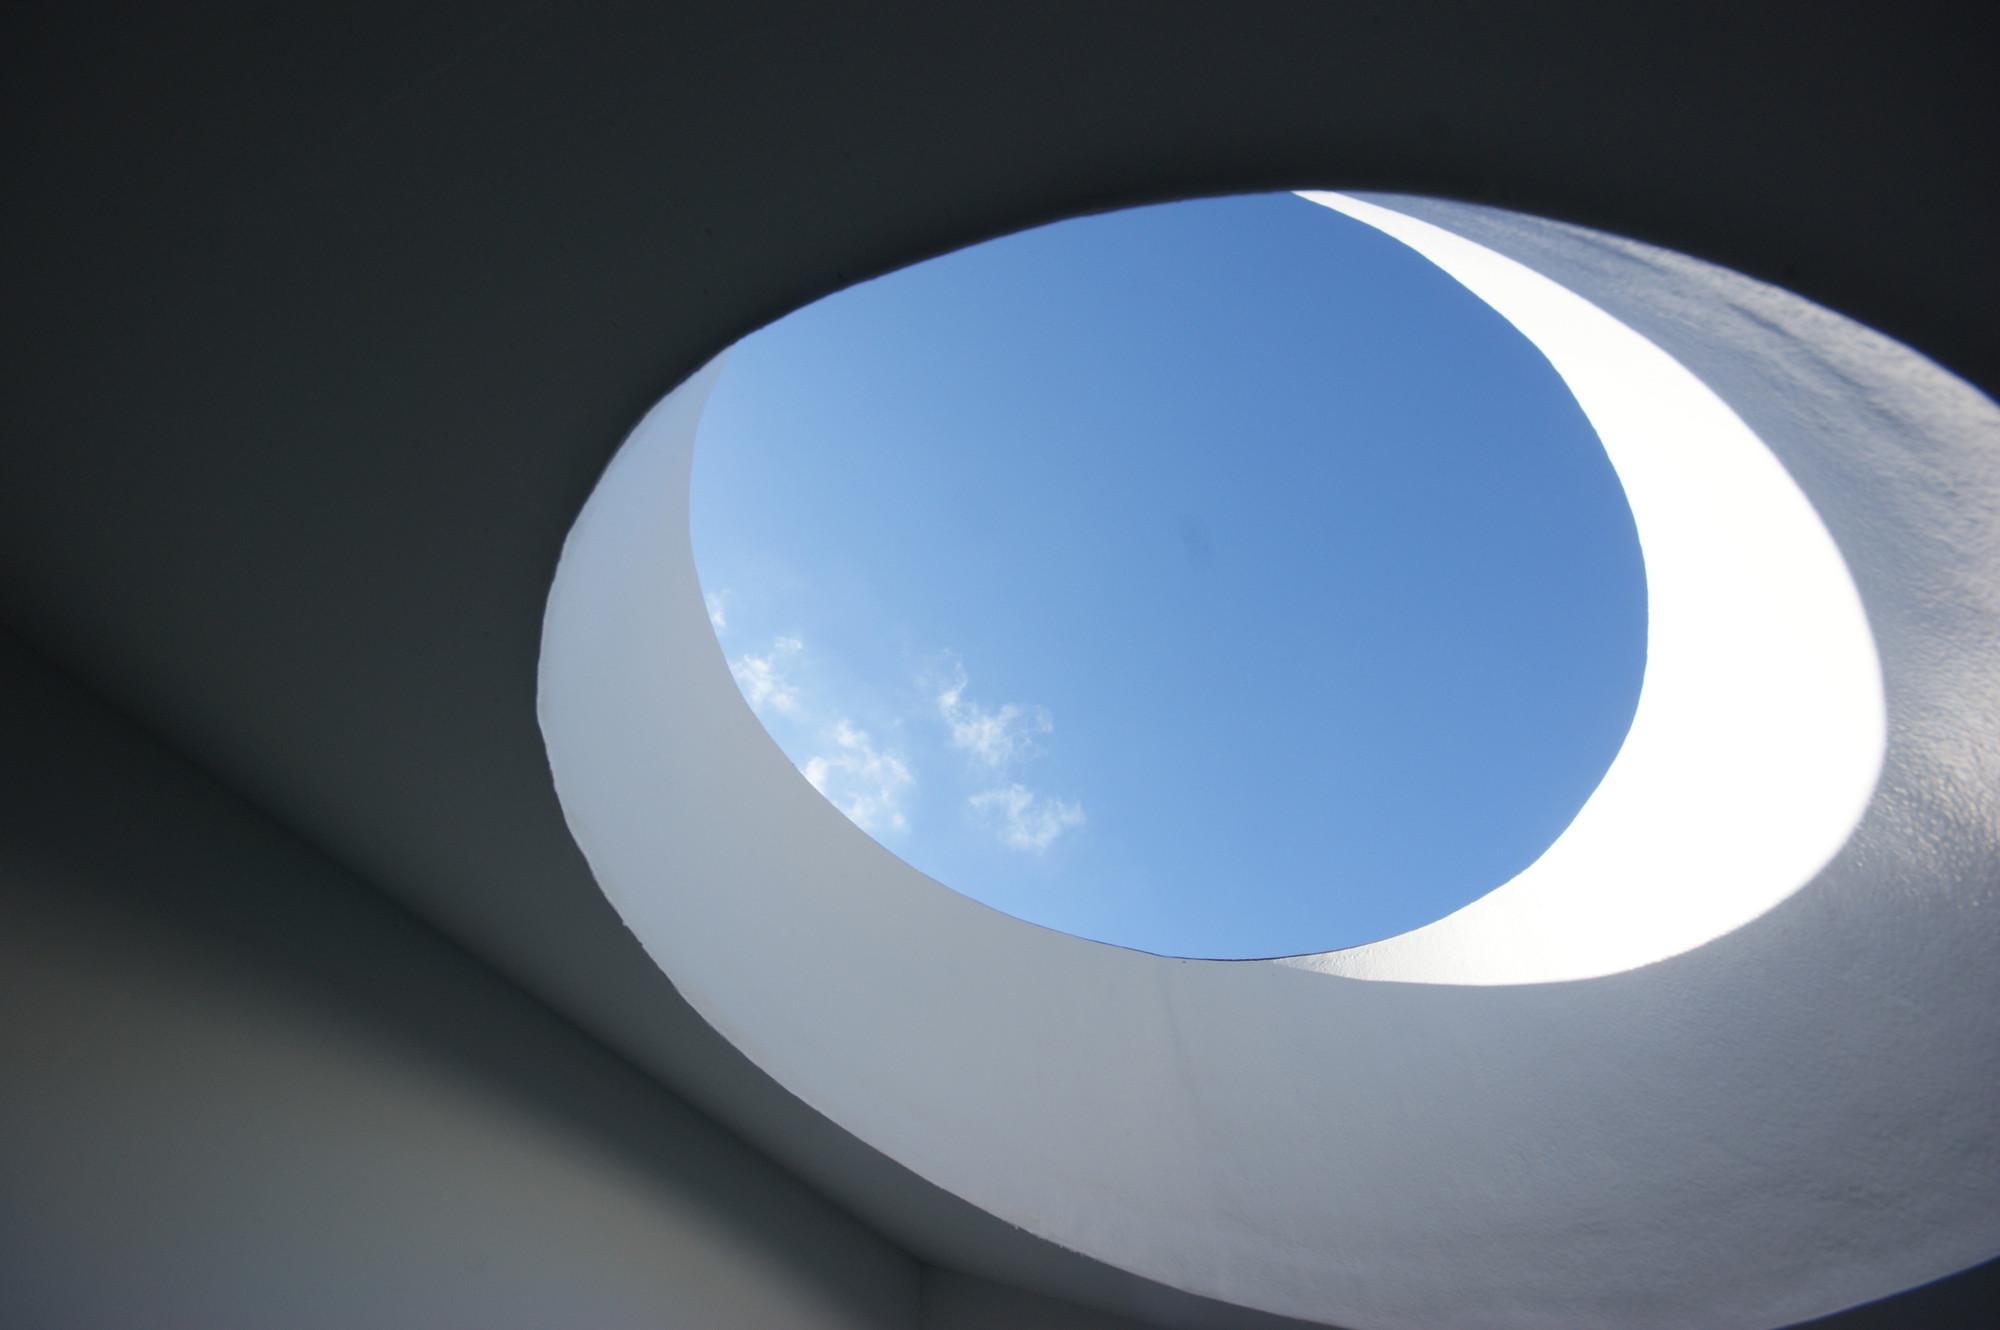 House Of Toilet / Daigo Ishii + Future Scape Architects